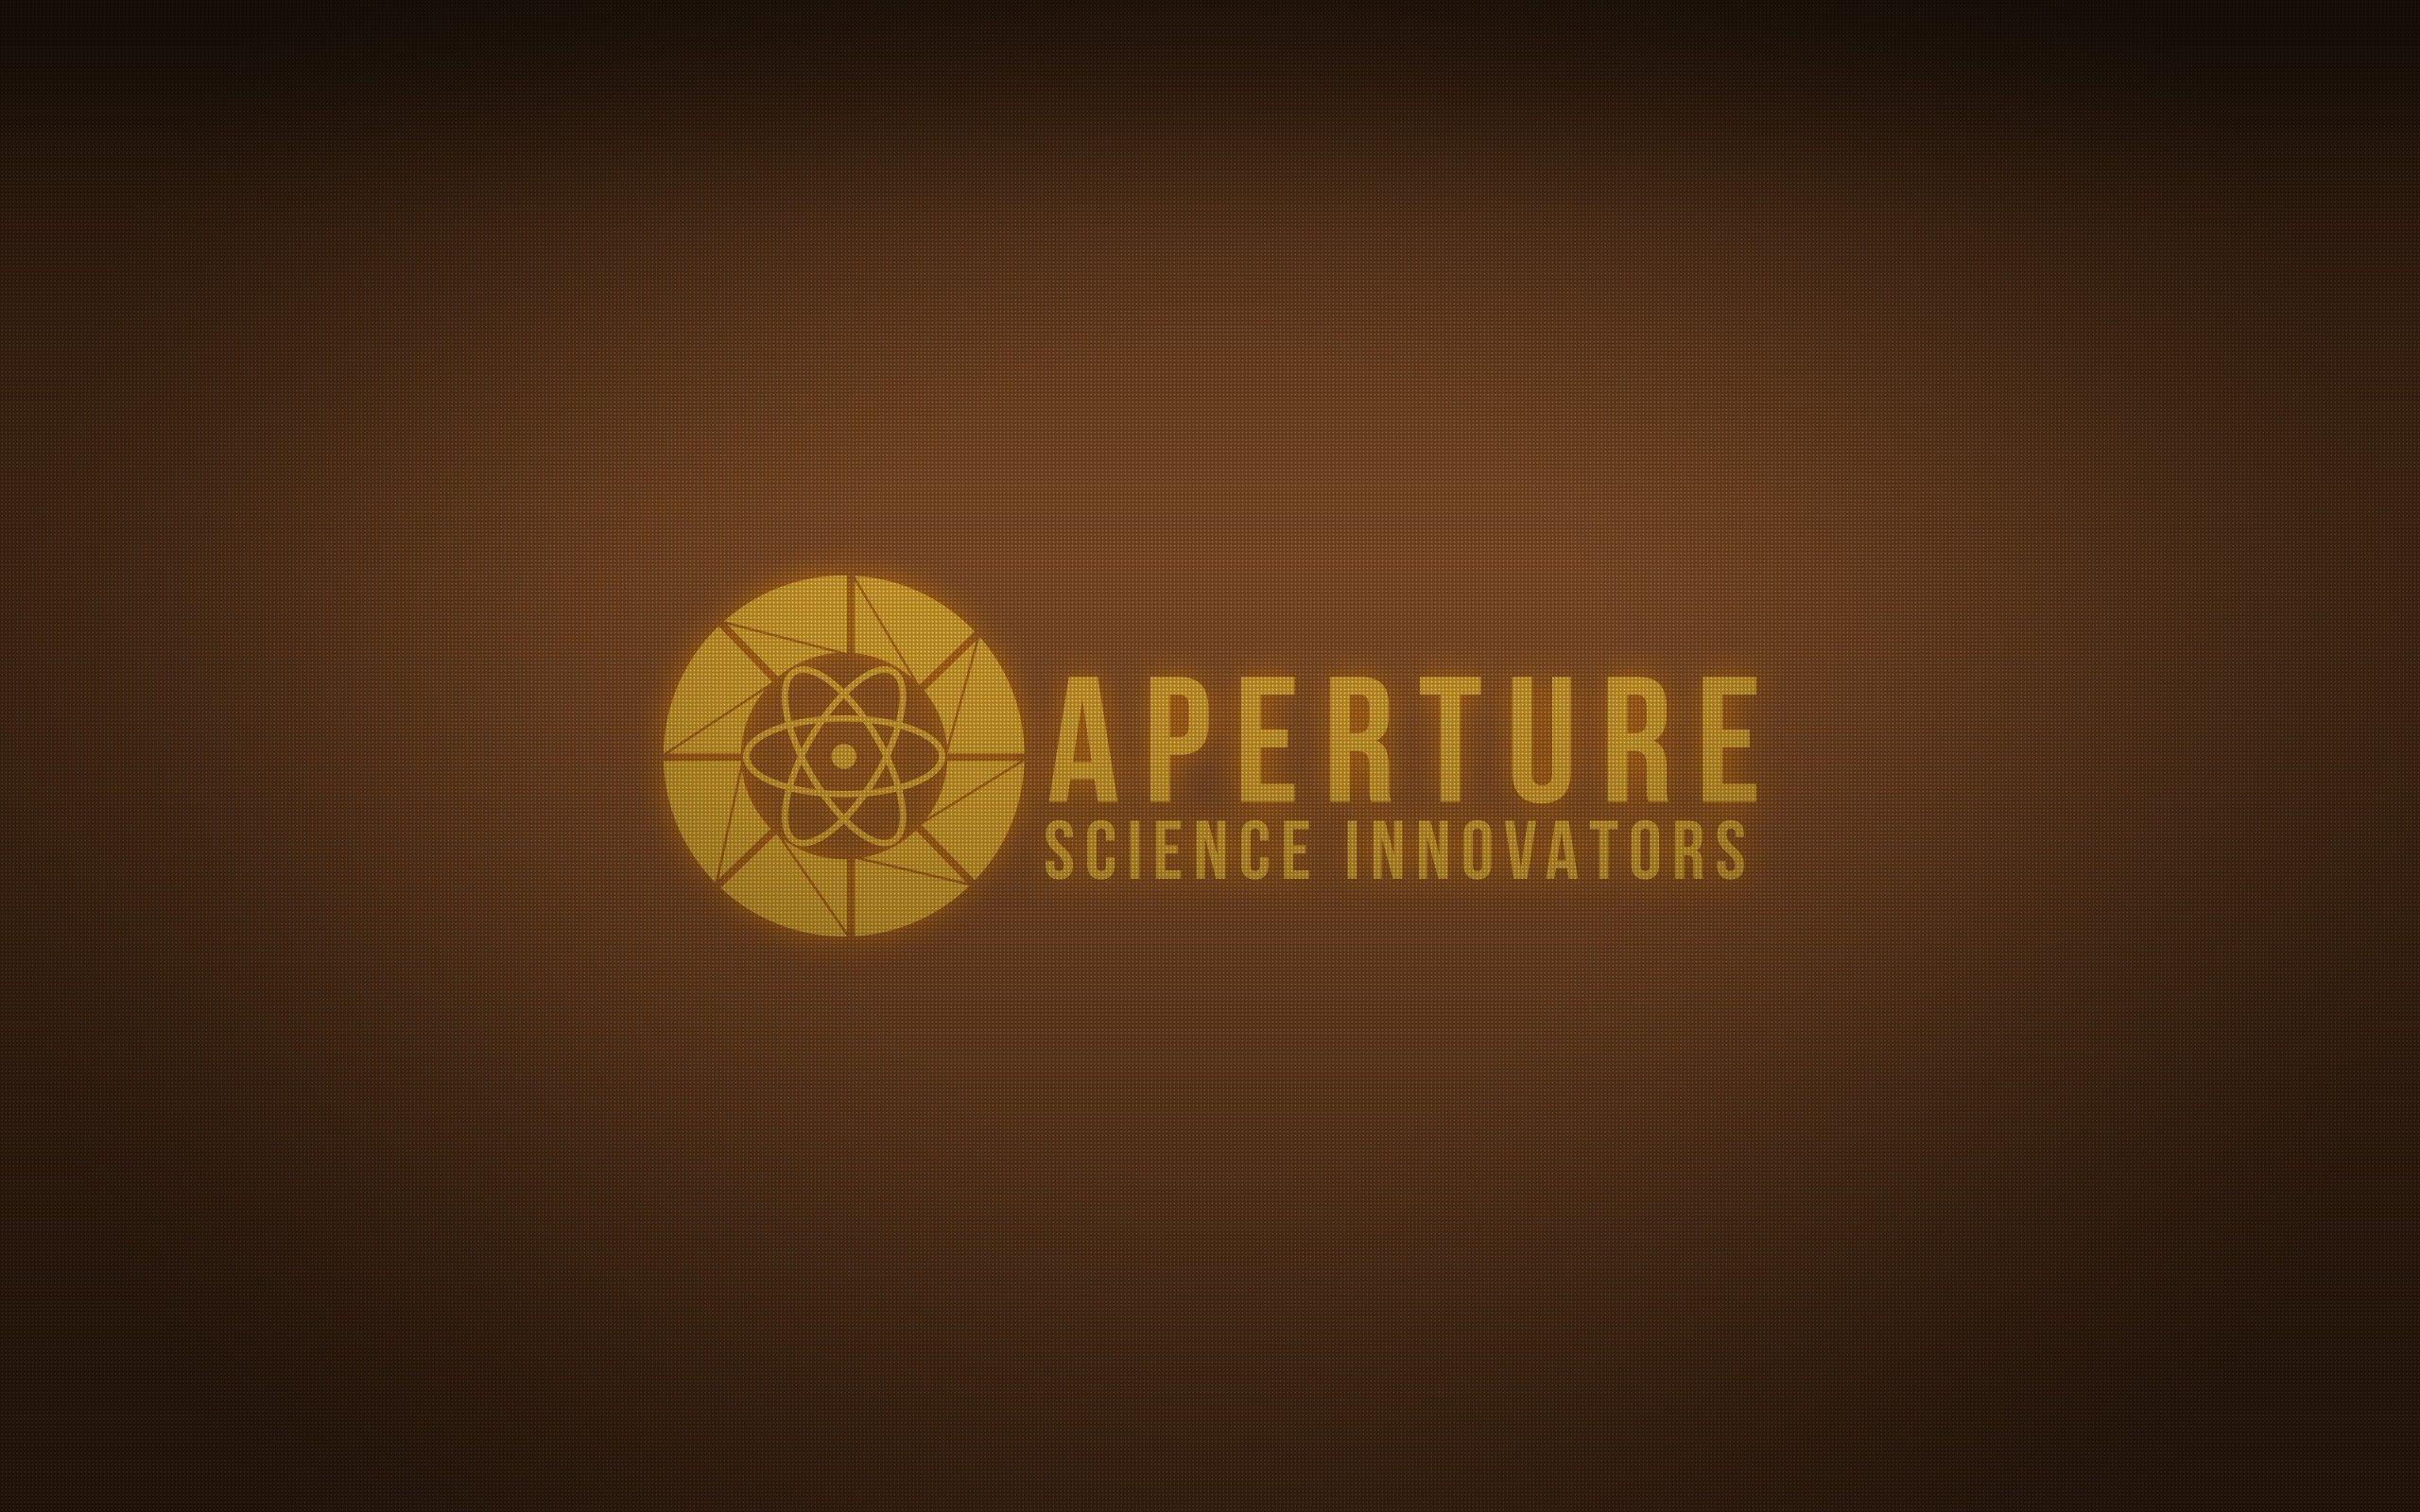 aperture wallpaper - photo #5